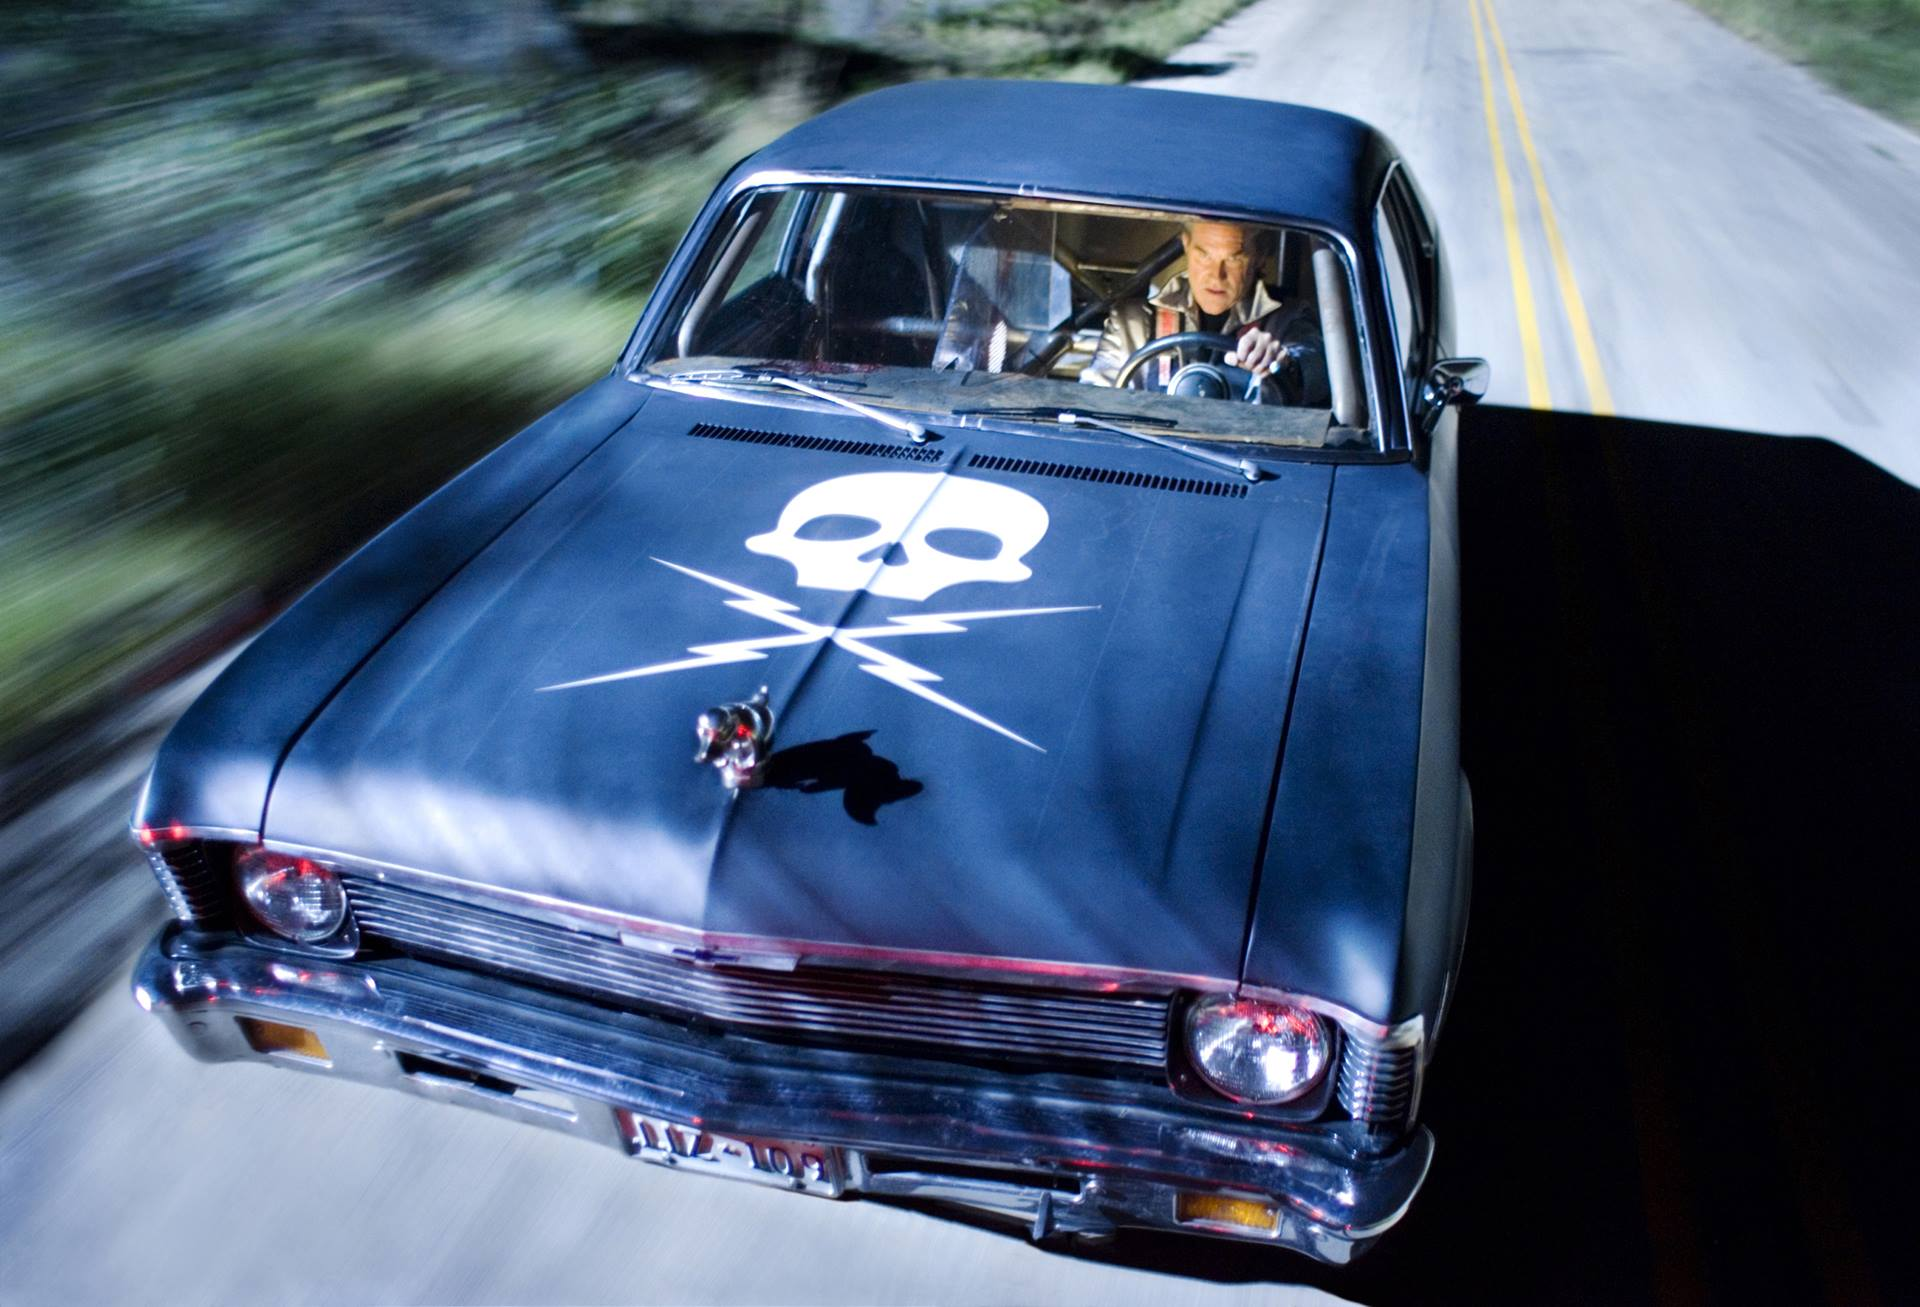 Stuntman Mike (Kurt Russell) in his 'death proof' car